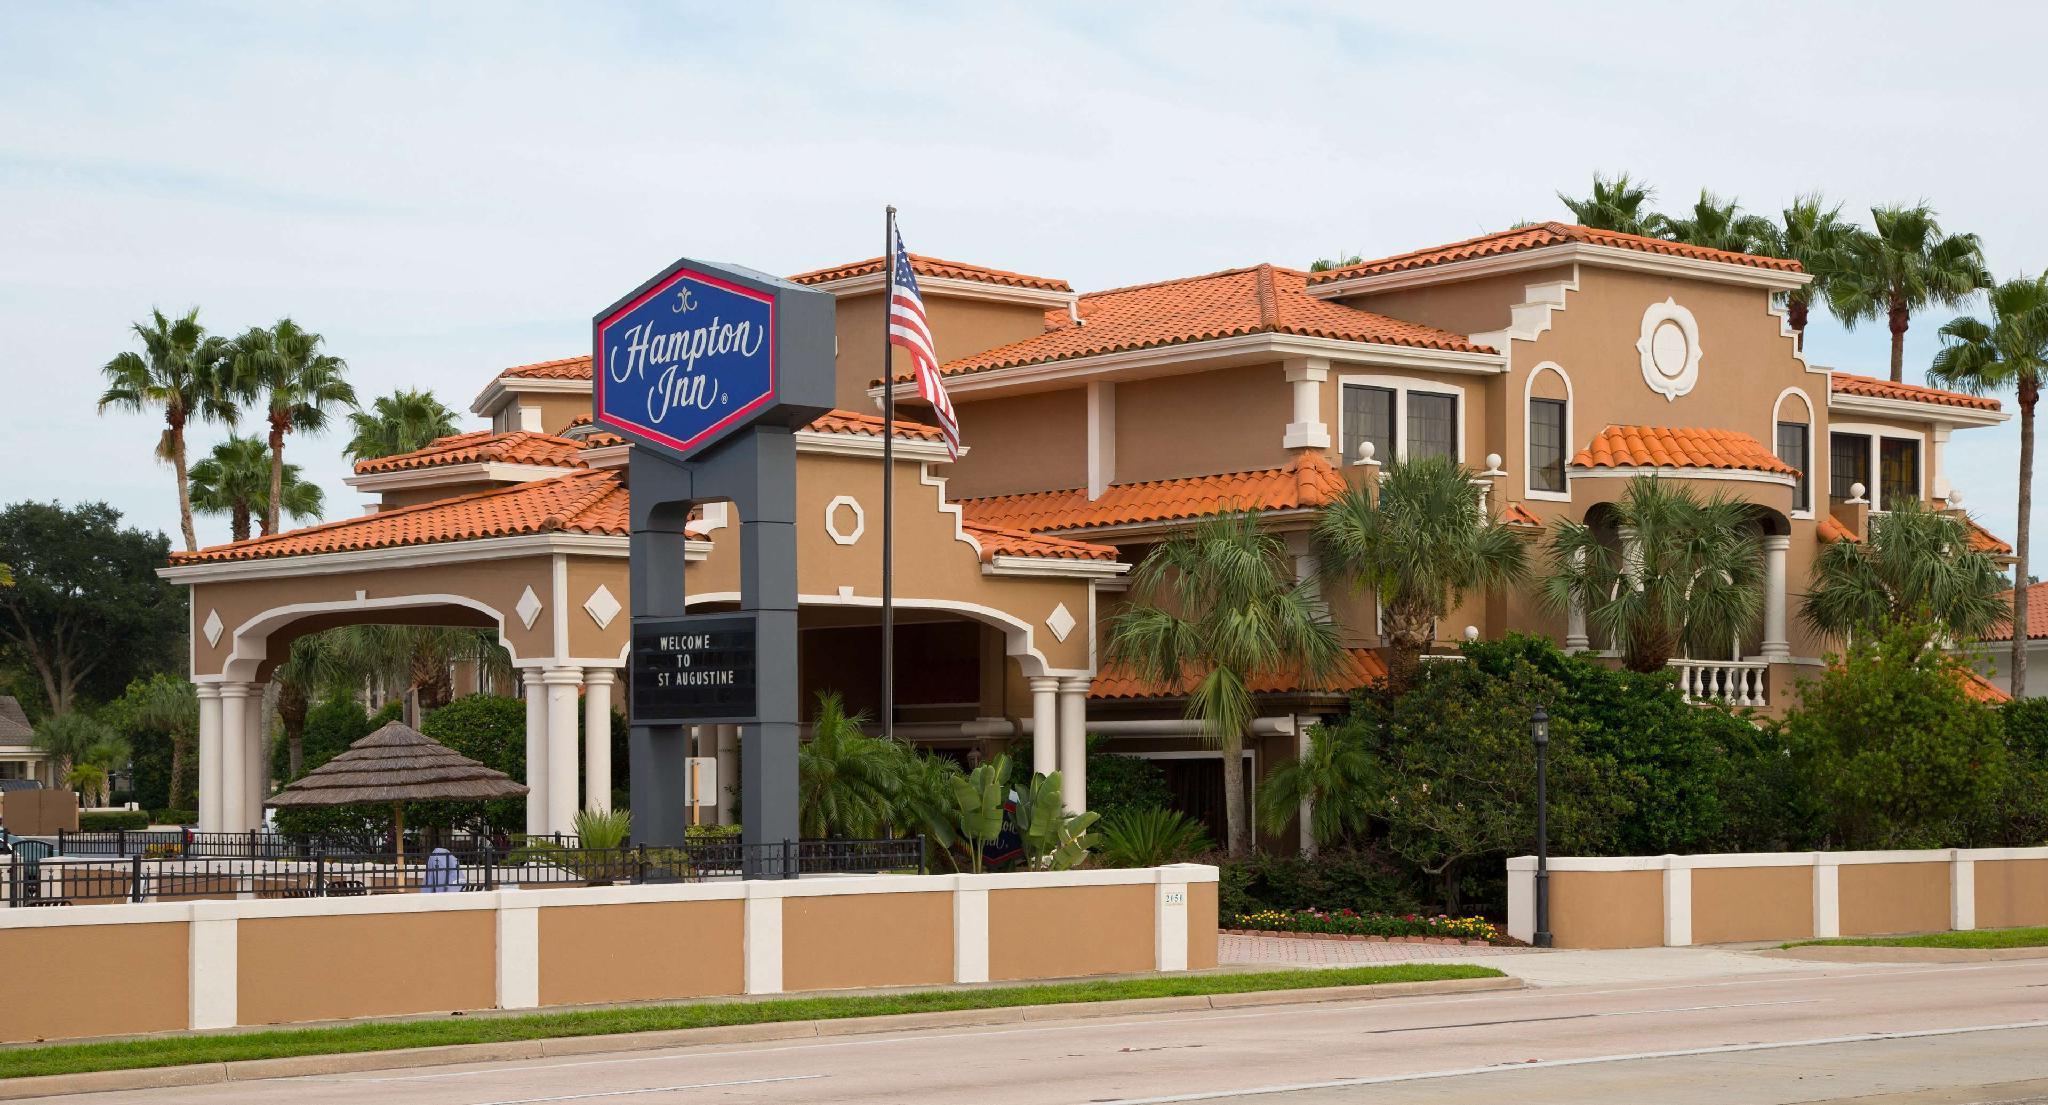 Hampton Inn St. Augustine Historic District